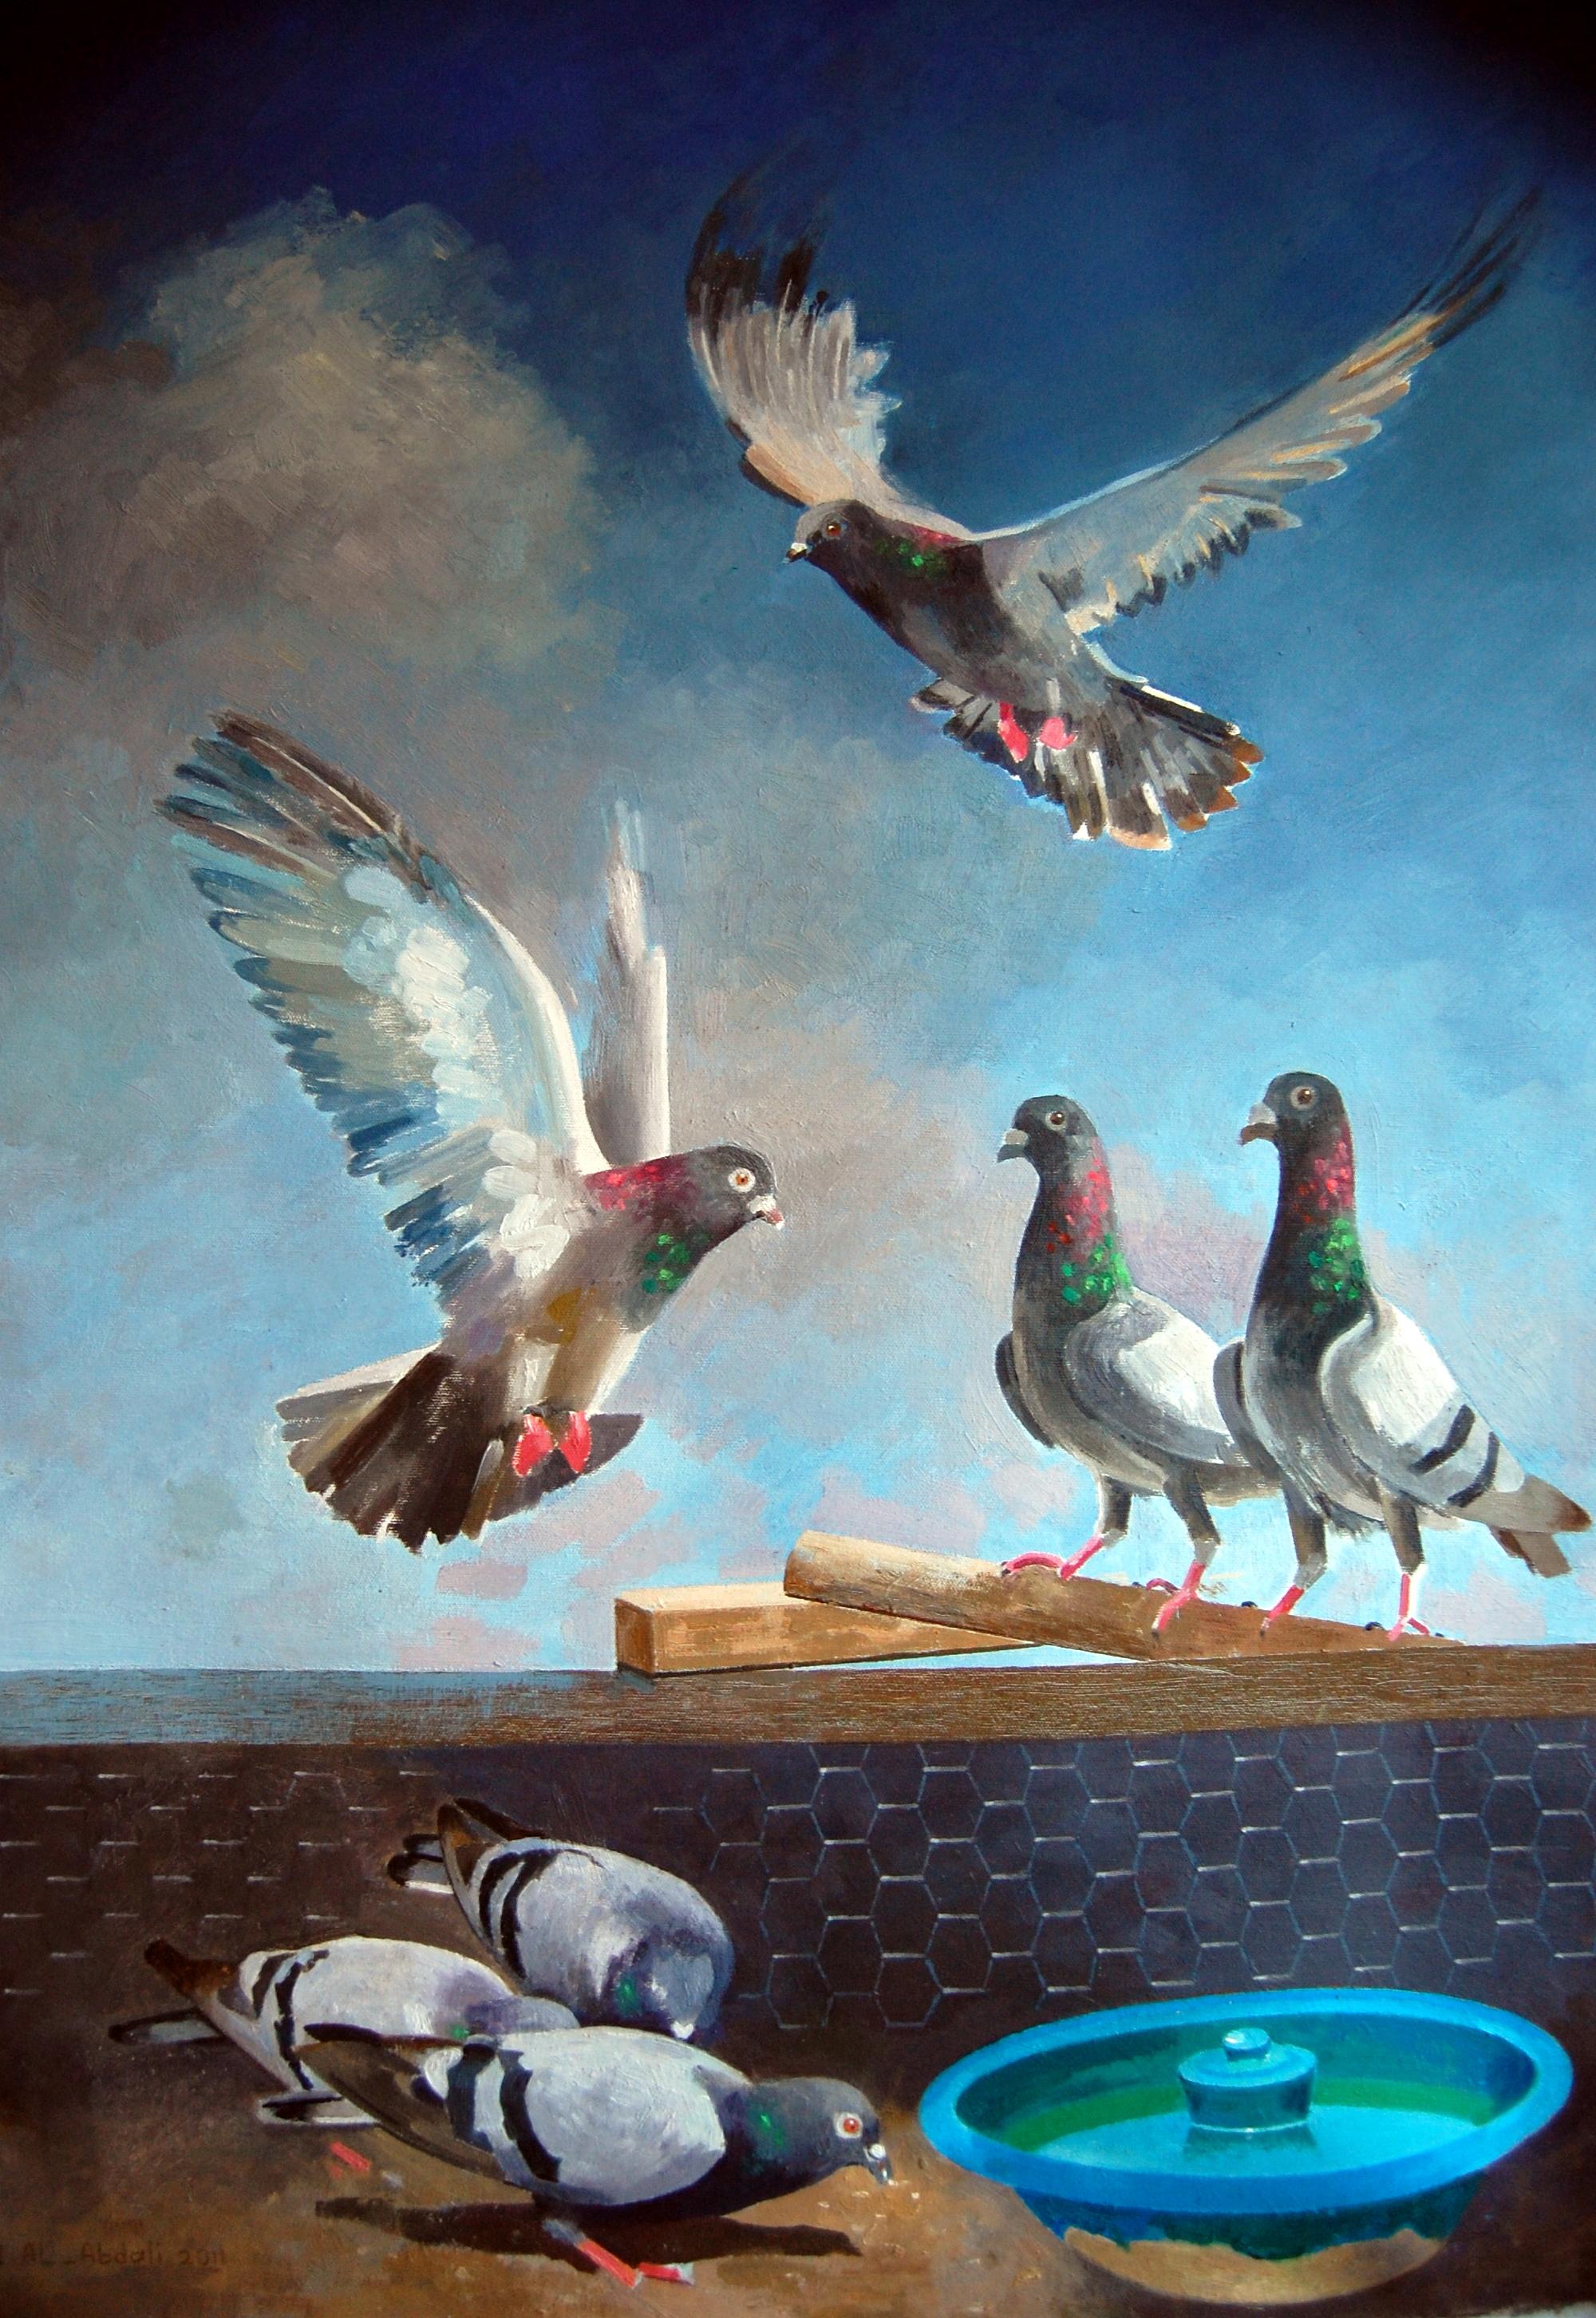 Artist Ibrahim Al-Abdali للفنان ابراهيم العبدلي